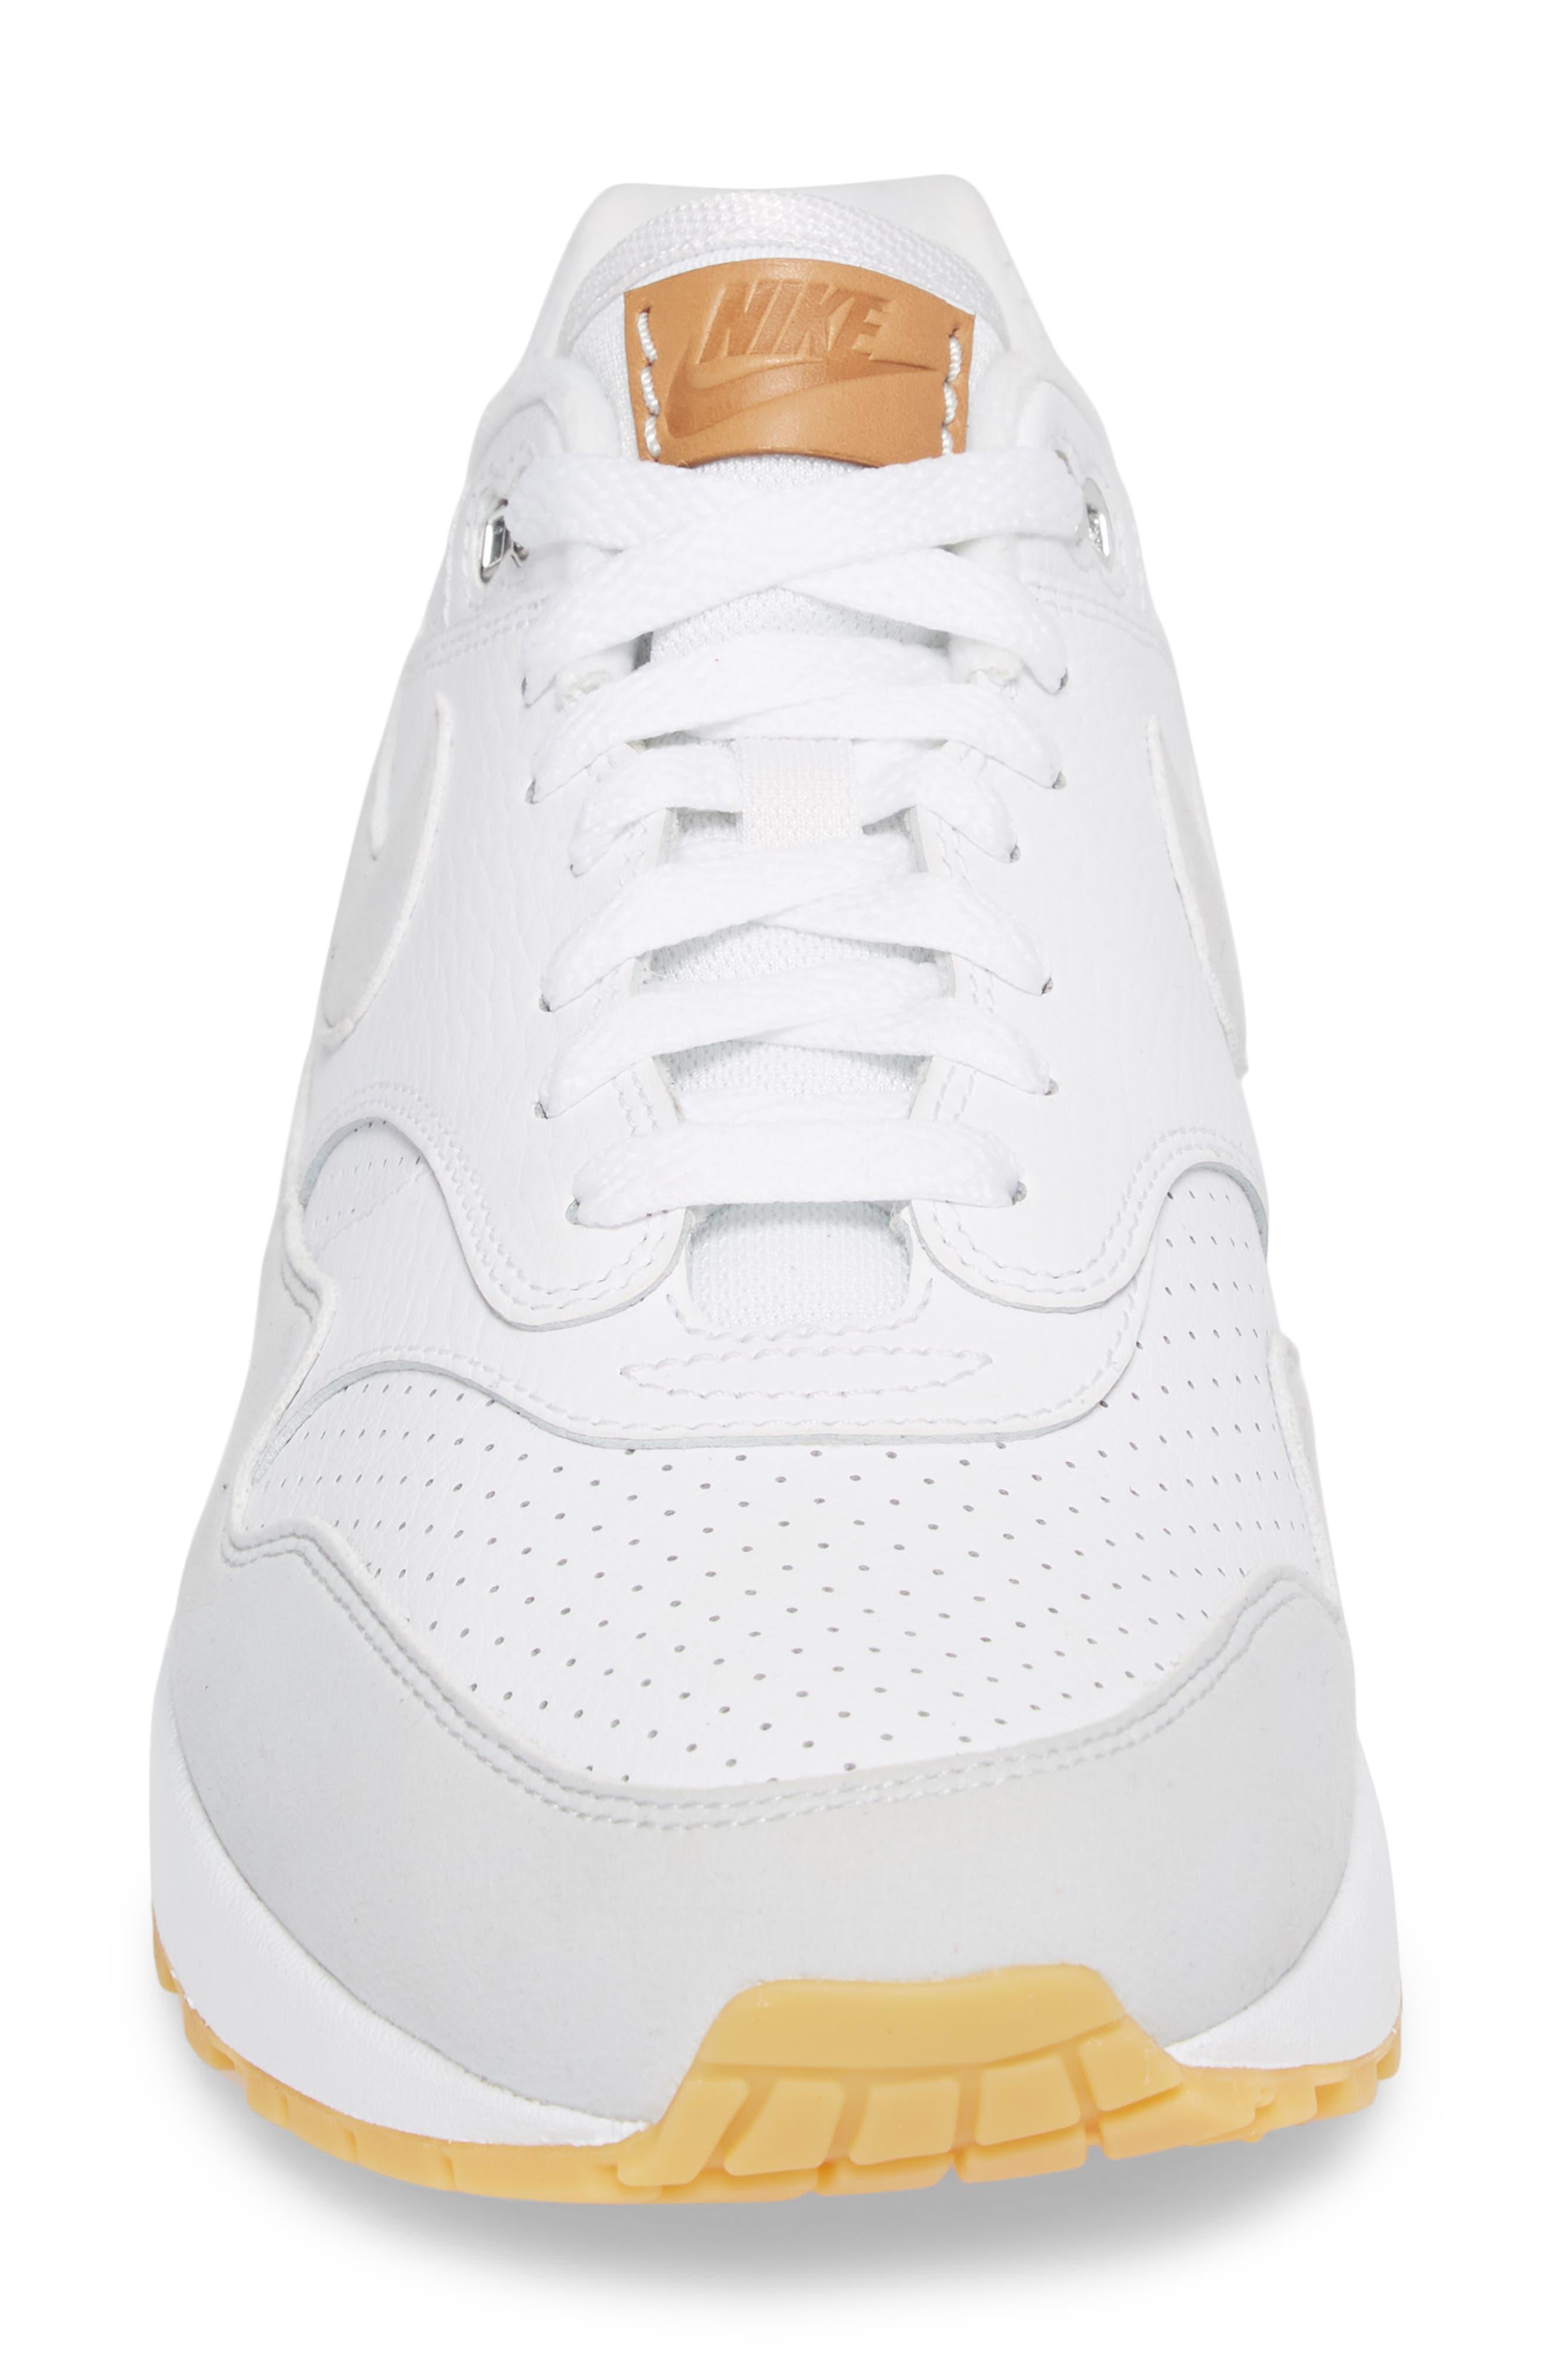 Air Max 1 Sneaker,                             Alternate thumbnail 4, color,                             White/ Pure Platinum/ Yellow